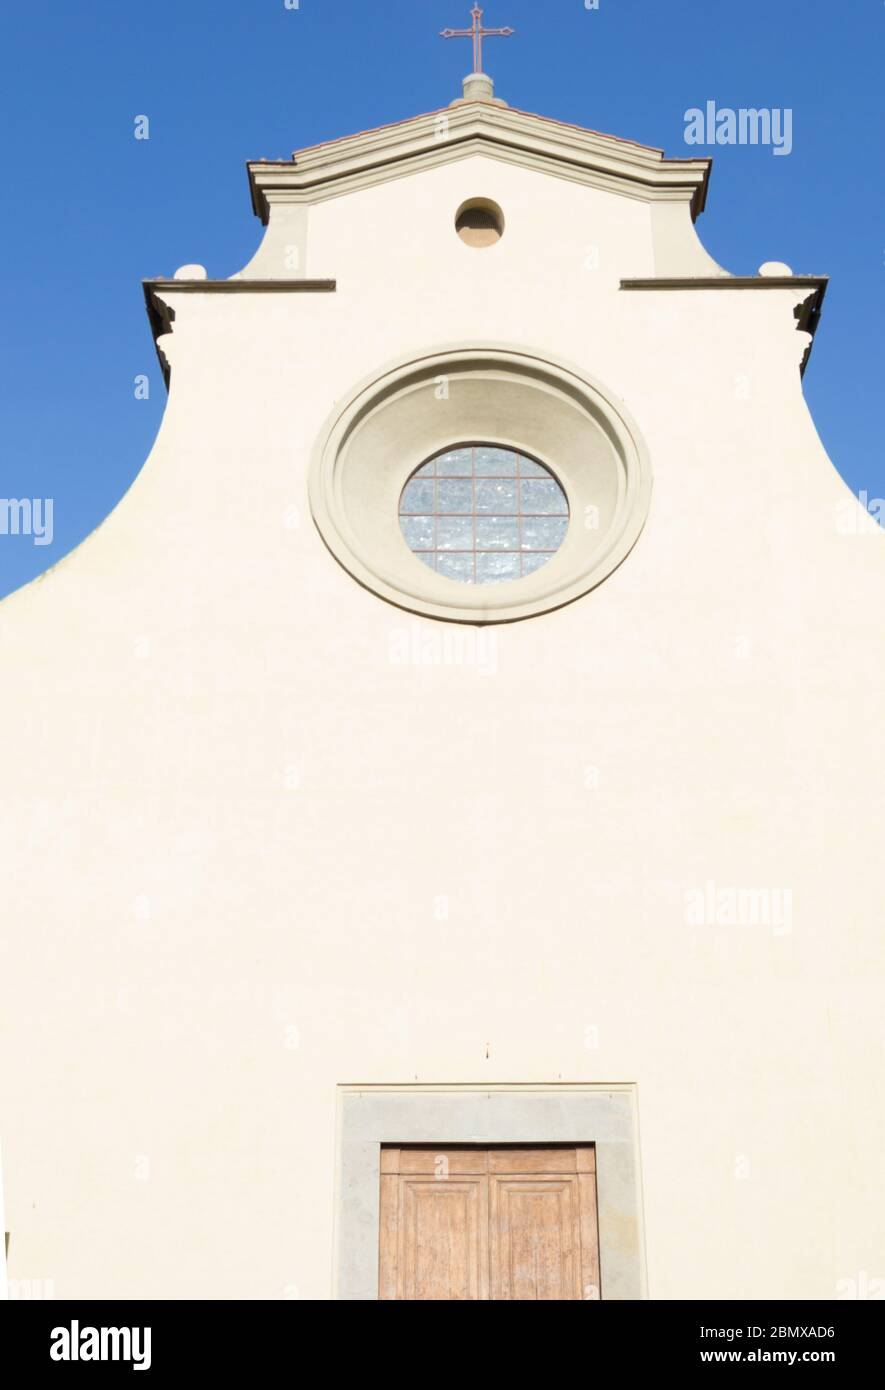 Detail of the minimal white facade of Santo Spirito church in Florence, Tuscany, Italy Stock Photo